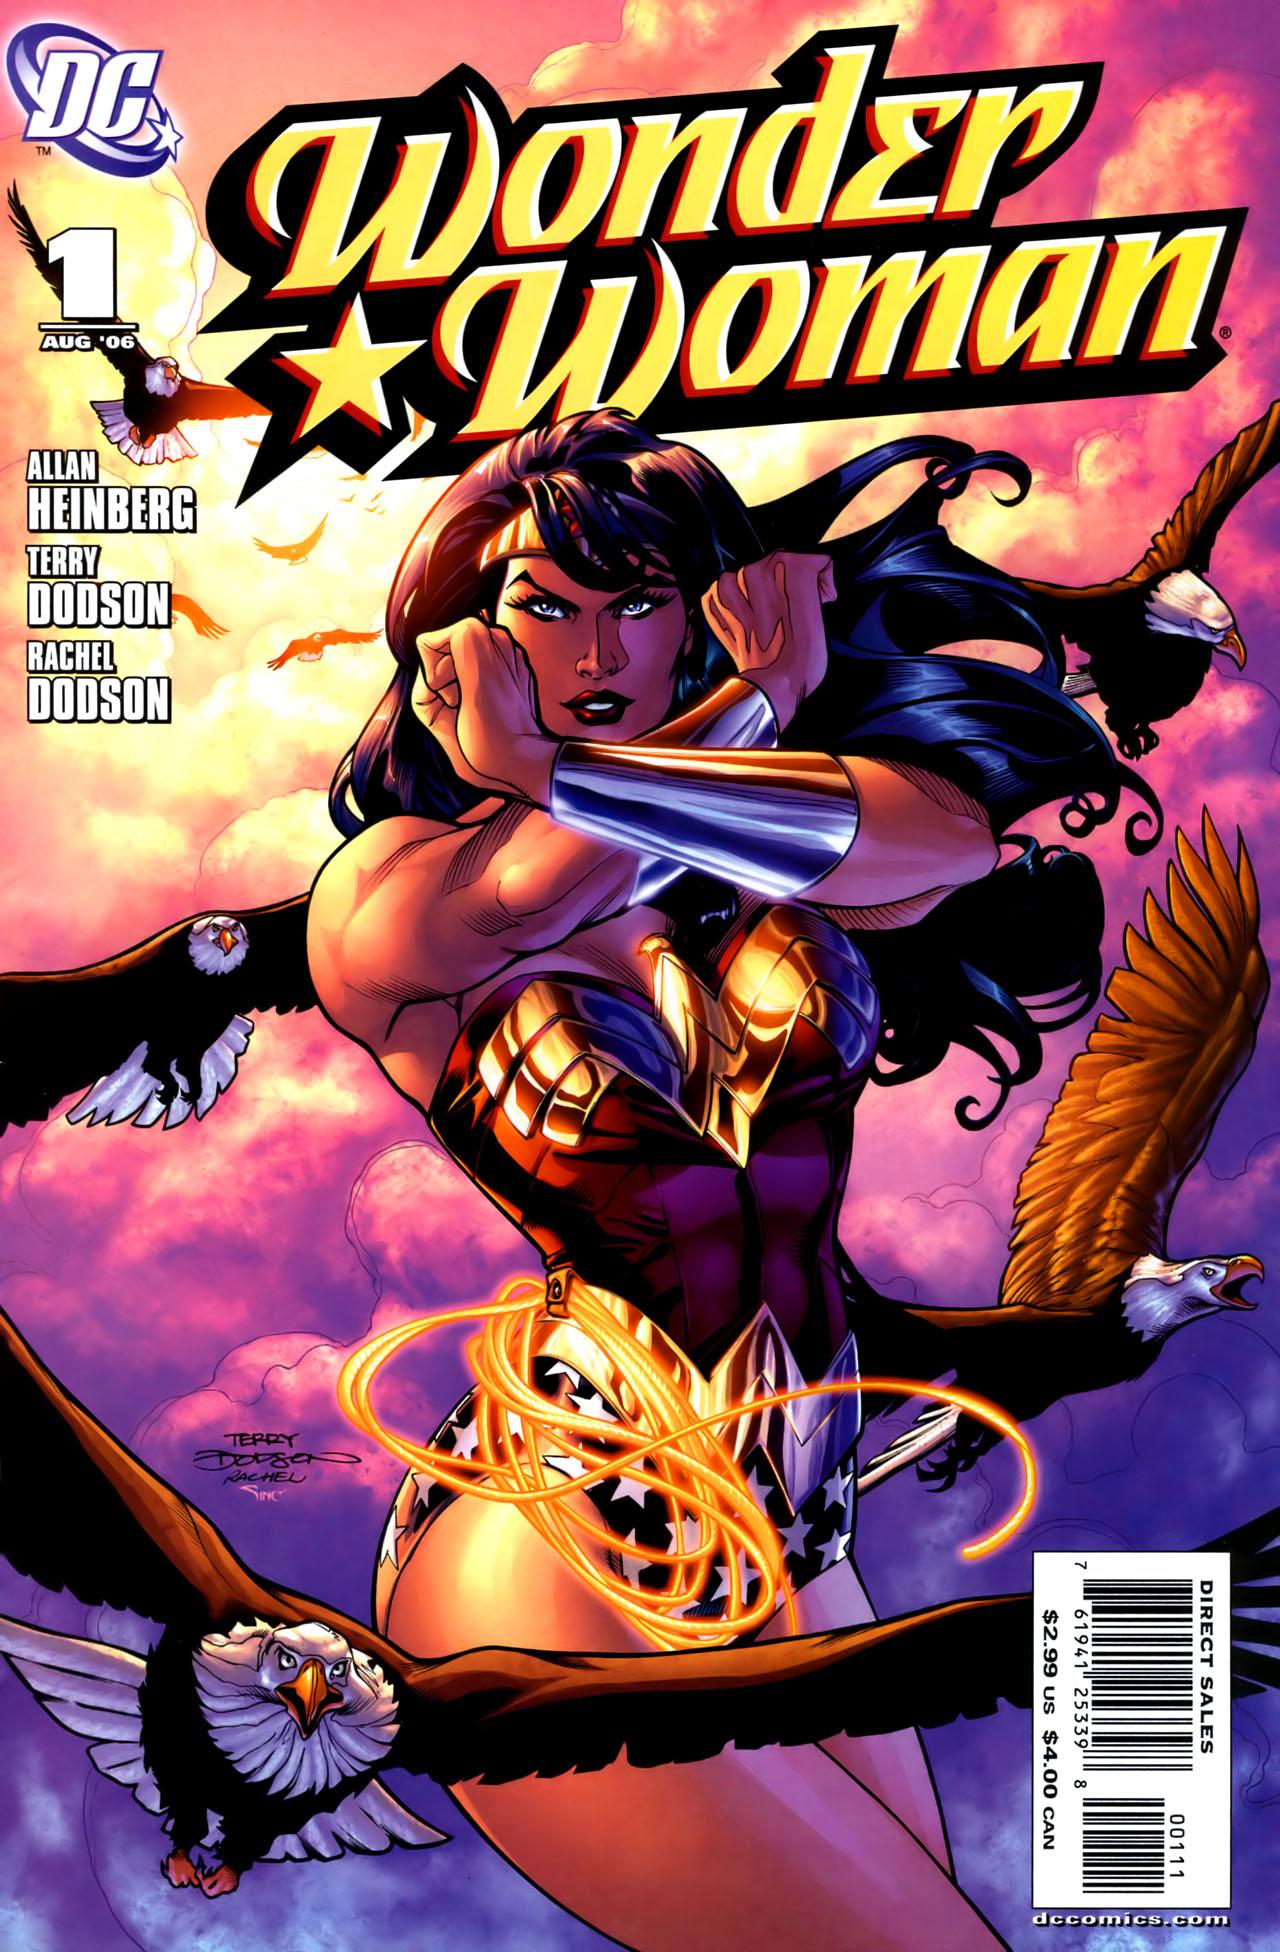 Read online Wonder Woman (2006) comic -  Issue #1 - 1